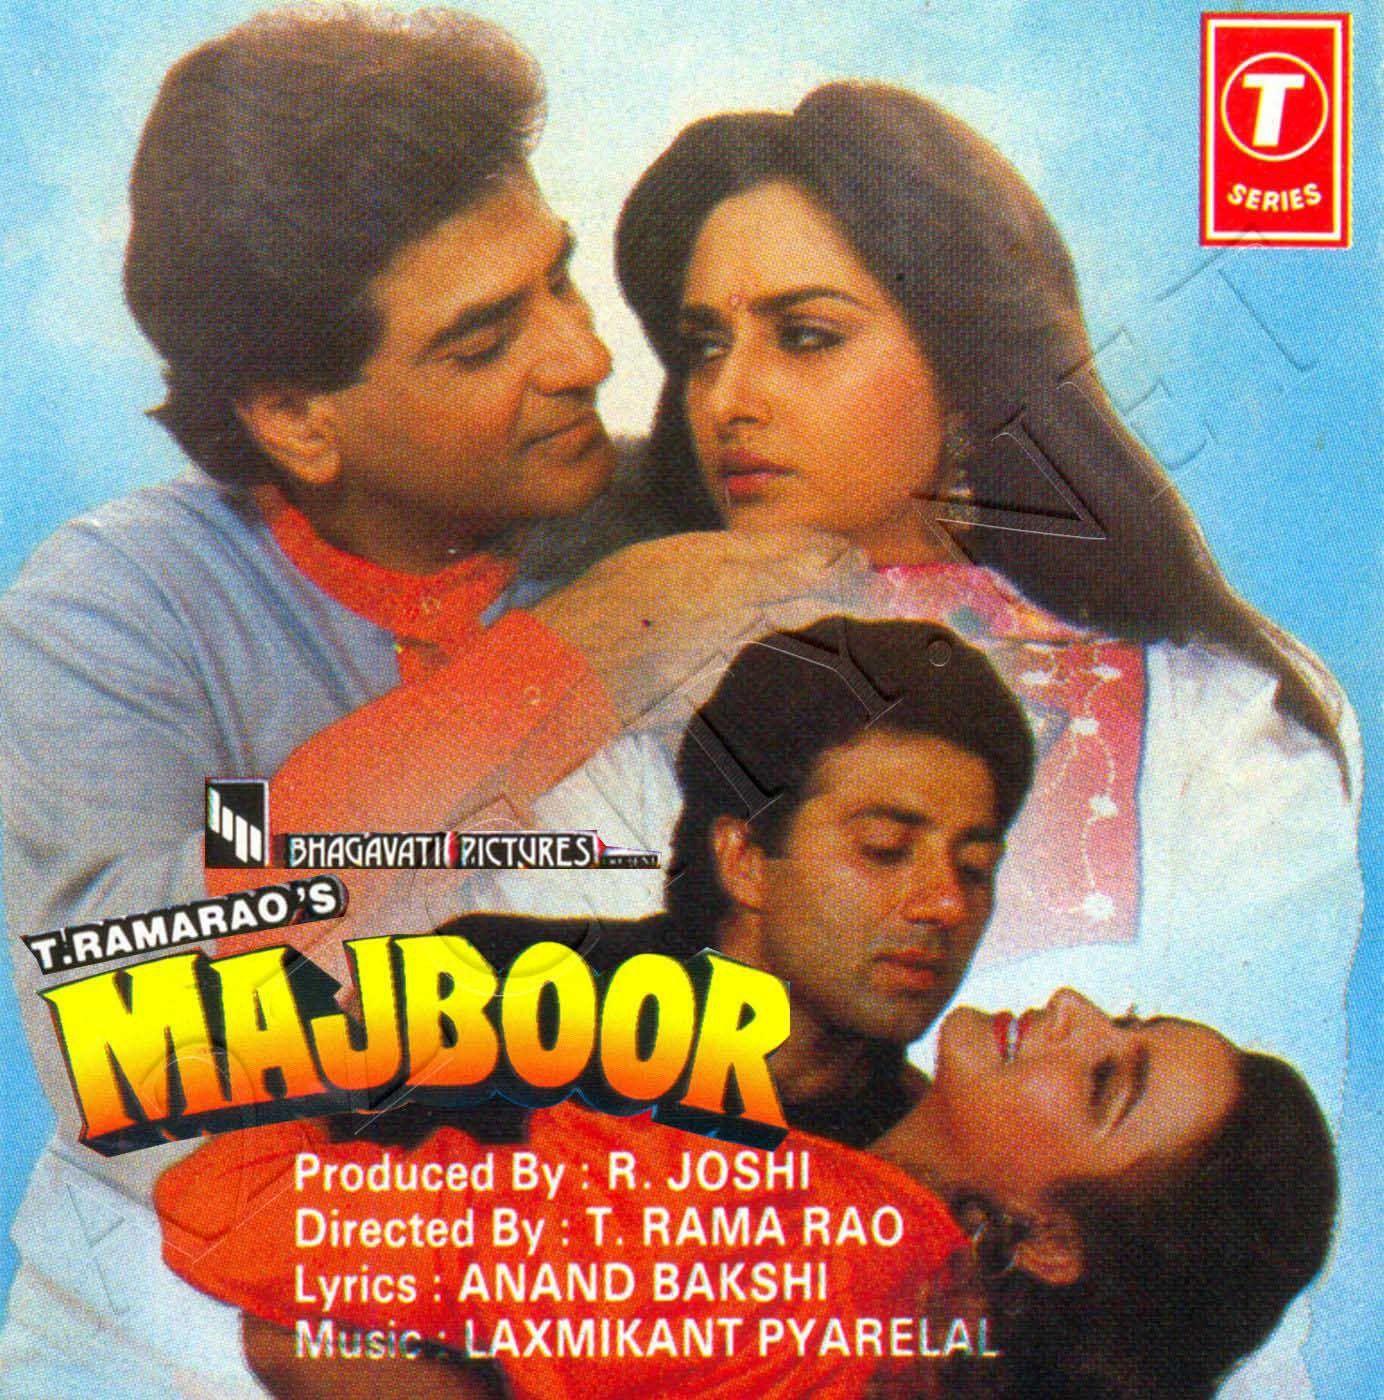 Majboor 1989 Flac Bollywood Movie Songs Mp3 Song Songs